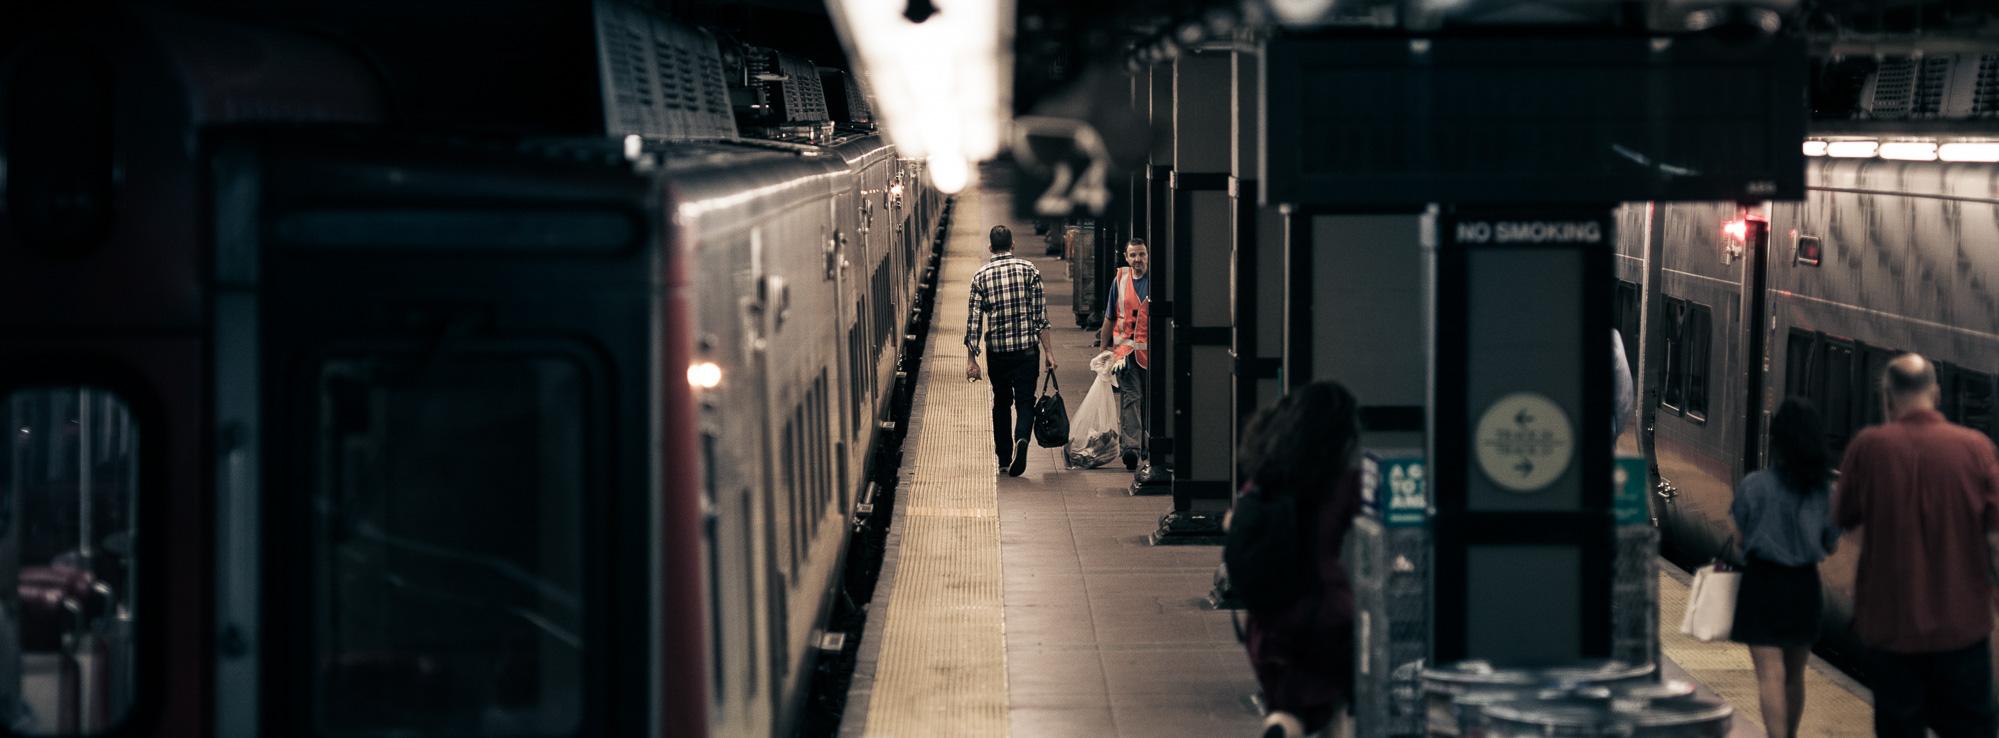 TomKluyver_NYC-4.jpg